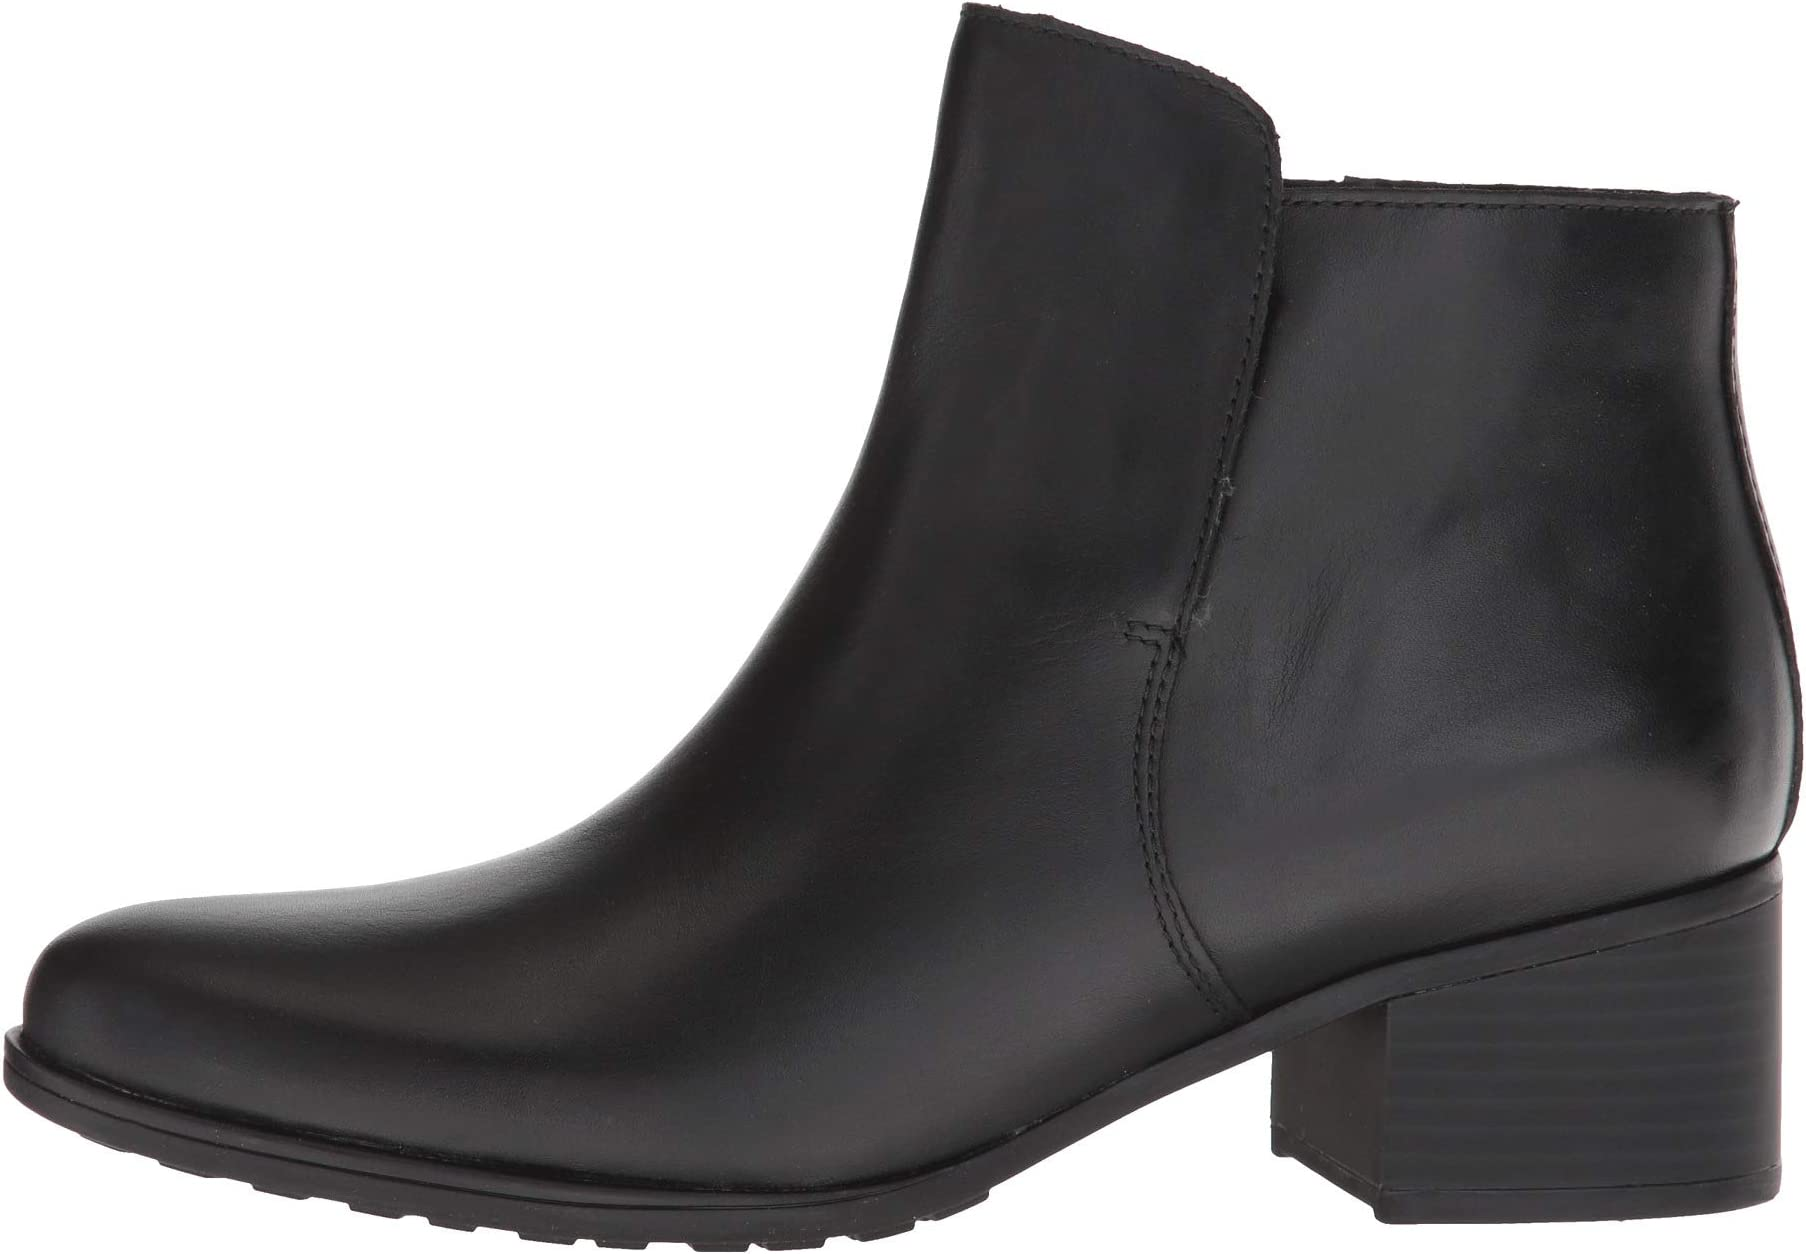 Naturalizer Deena Waterproof | Women's shoes | 2020 Newest